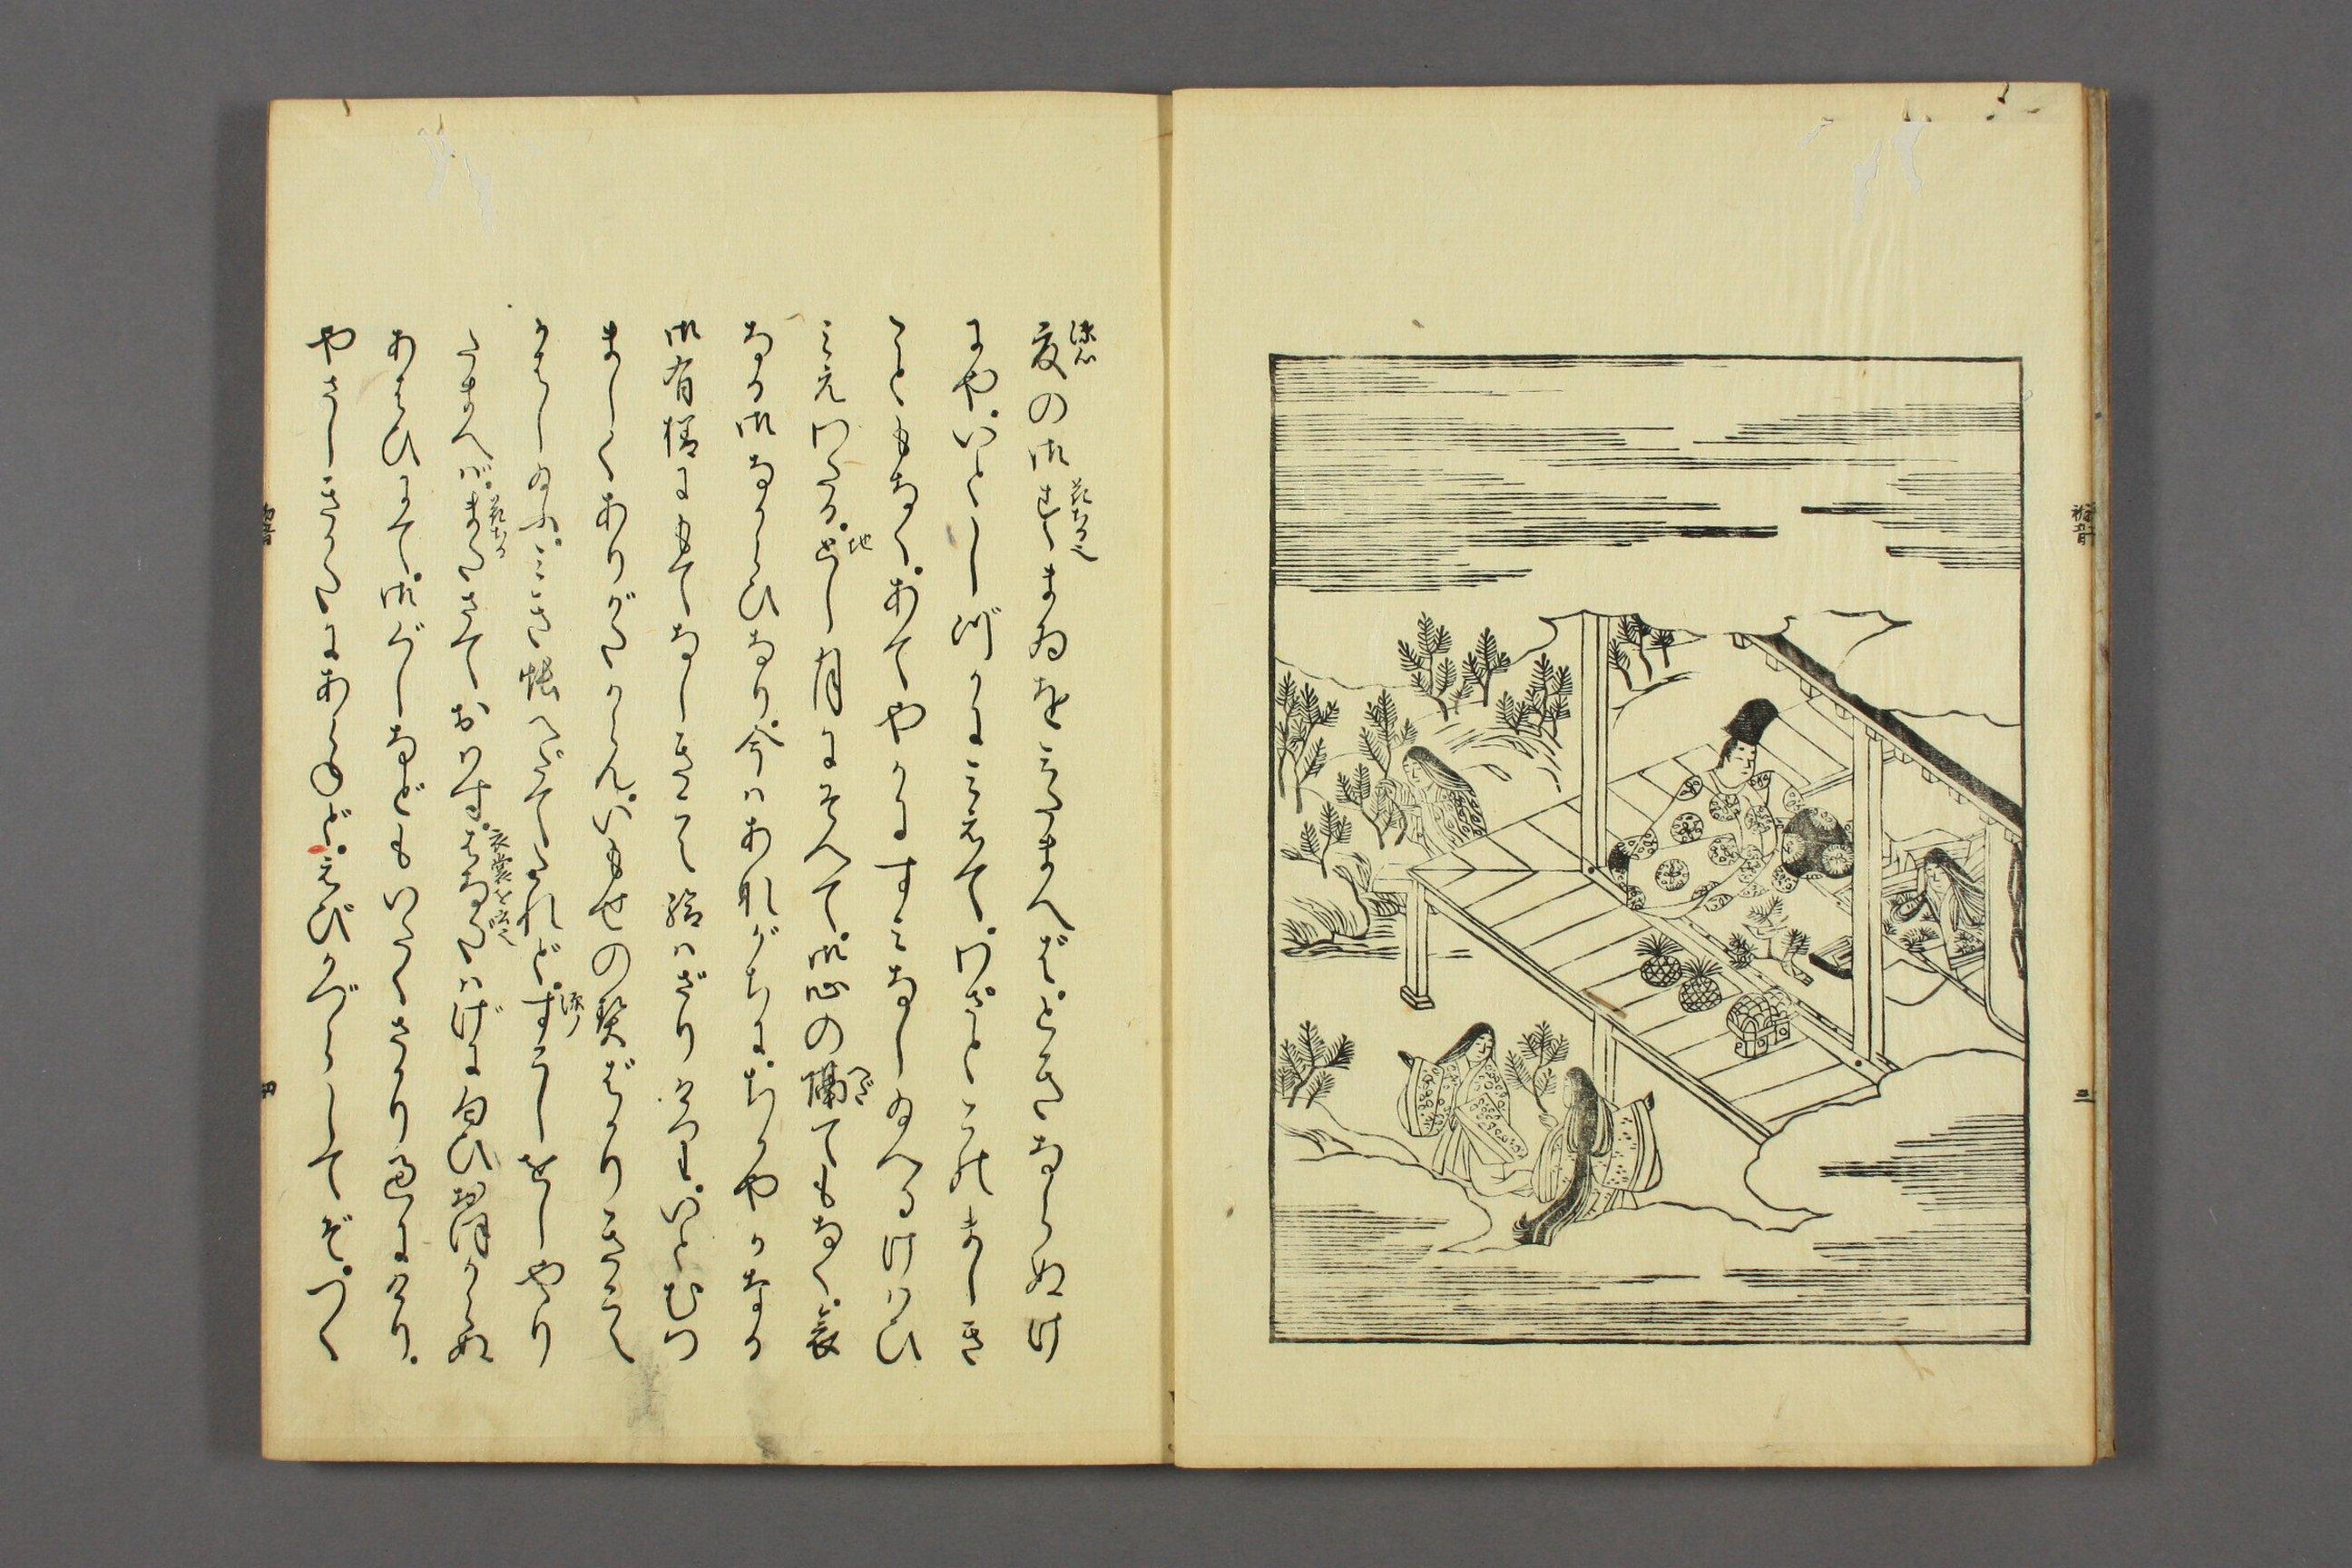 http://archive.wul.waseda.ac.jp/kosho/bunko30/bunko30_a0007/bunko30_a0007_0023/bunko30_a0007_0023_p0005.jpg